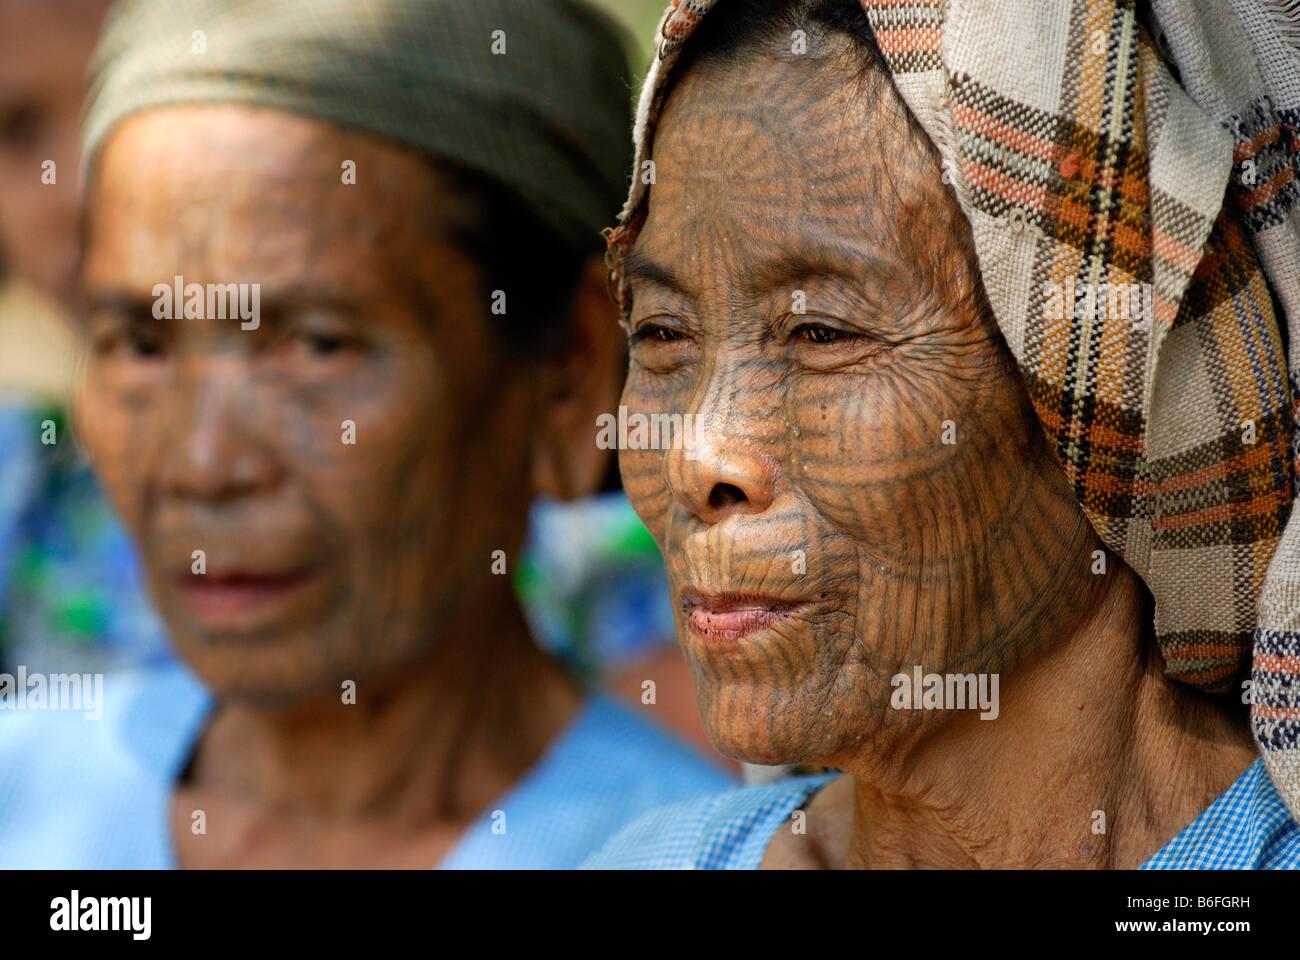 Tattooed women, so called spider women, Mrauk-U, Burma, also called Myanmar, Southeast Asia Stock Photo